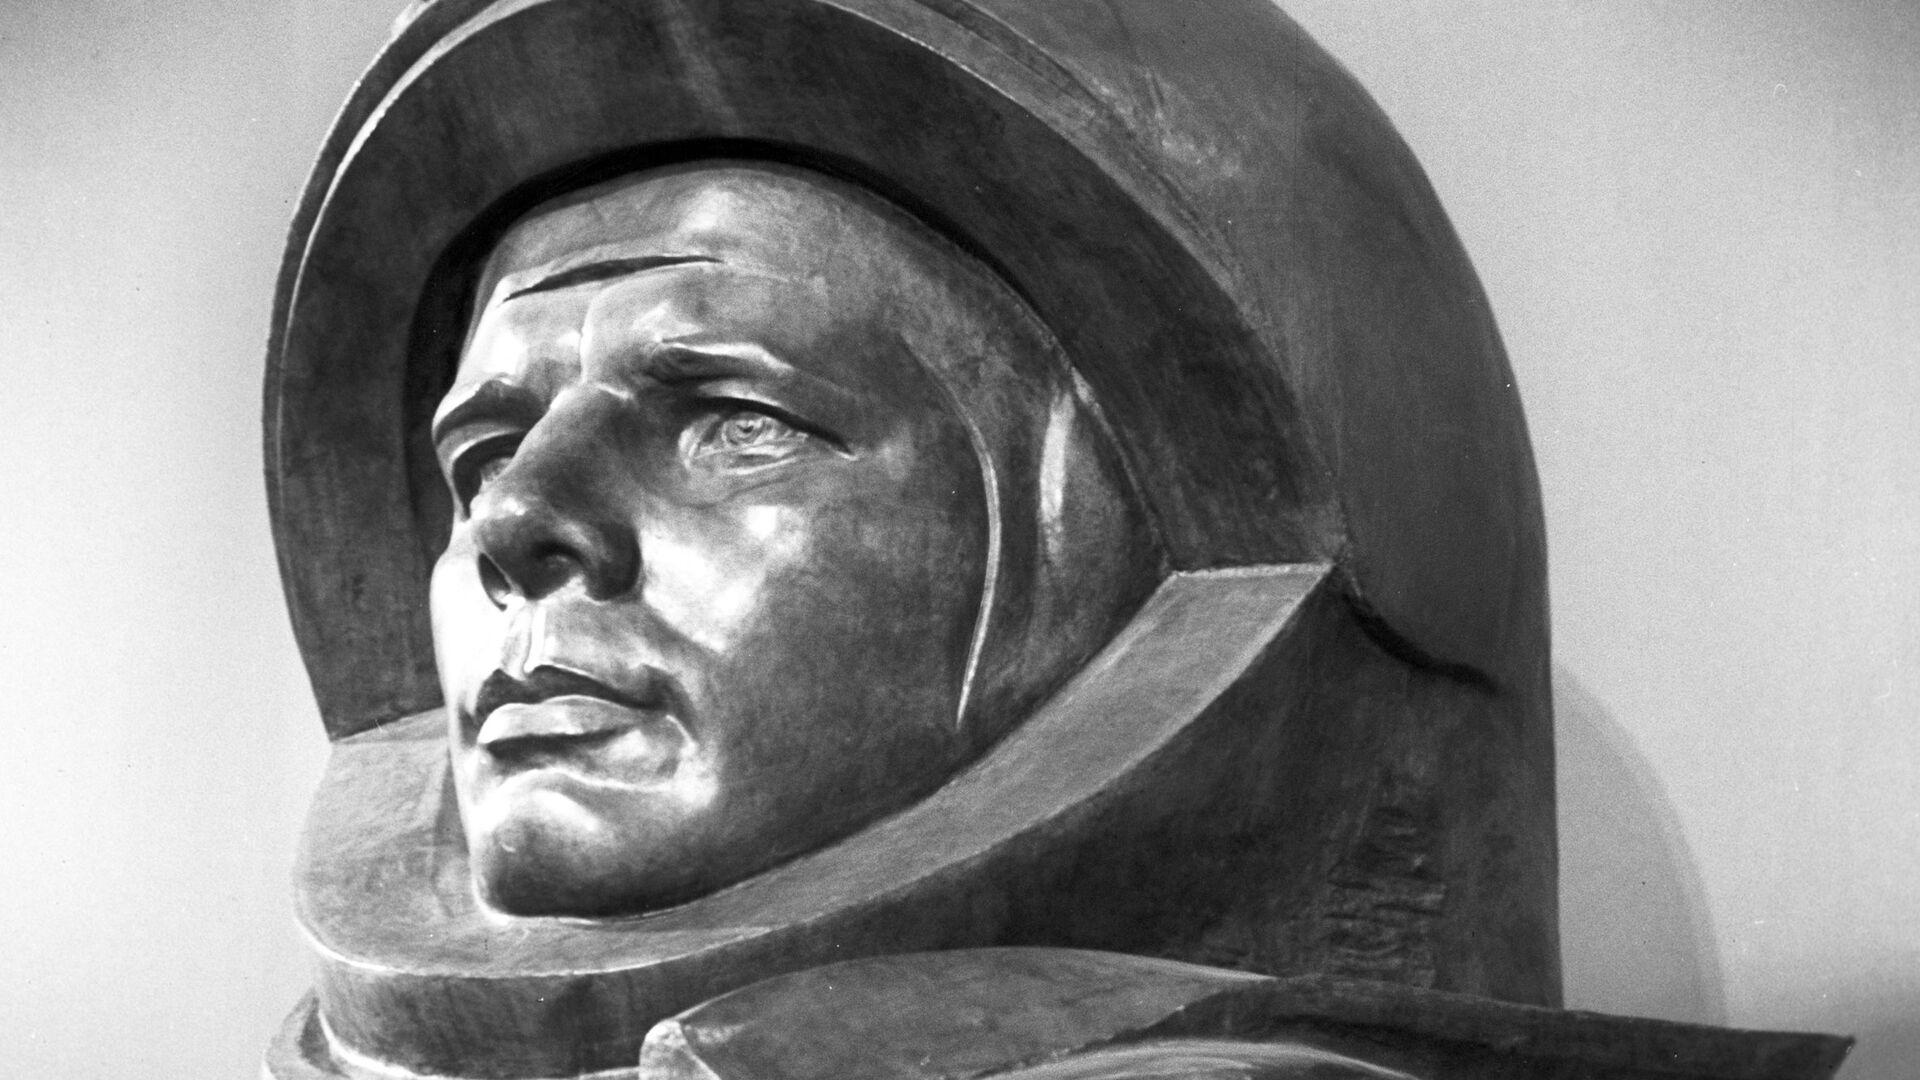 Yuri Gagarin, el cosmonauta soviético y primer ser humano en salir al espacio exterior - Sputnik Mundo, 1920, 11.04.2021